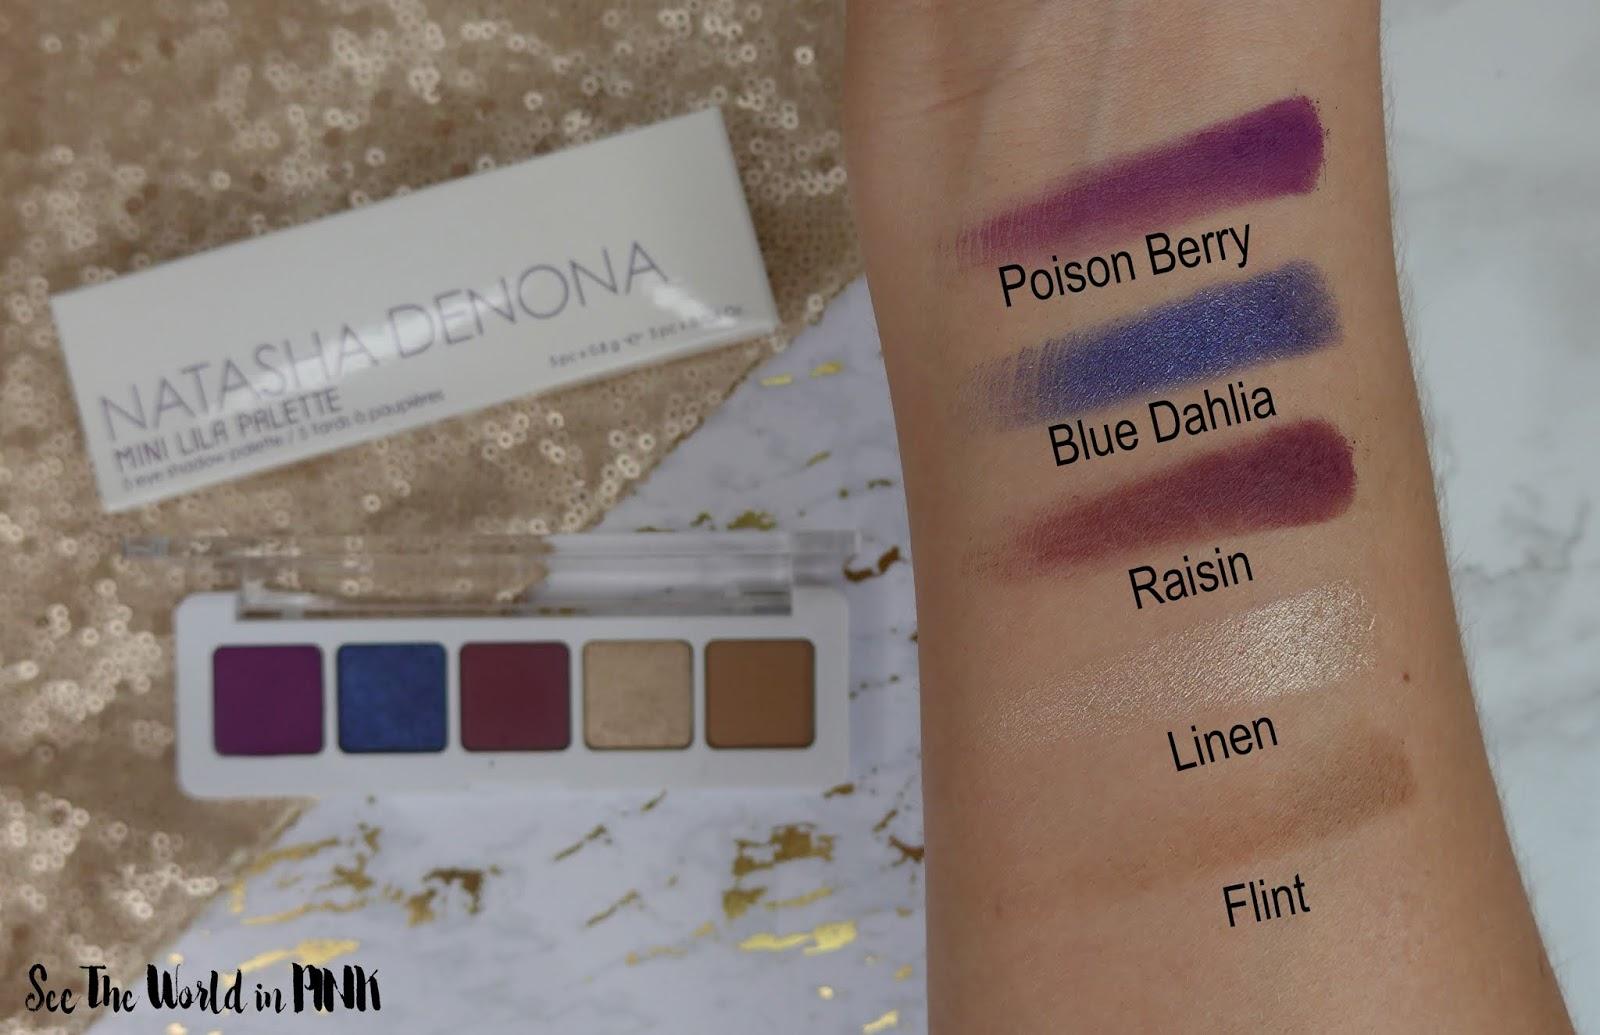 Natasha Denona Mini Lila Eyeshadow Palette - Swatches, Makeup Look and Review!